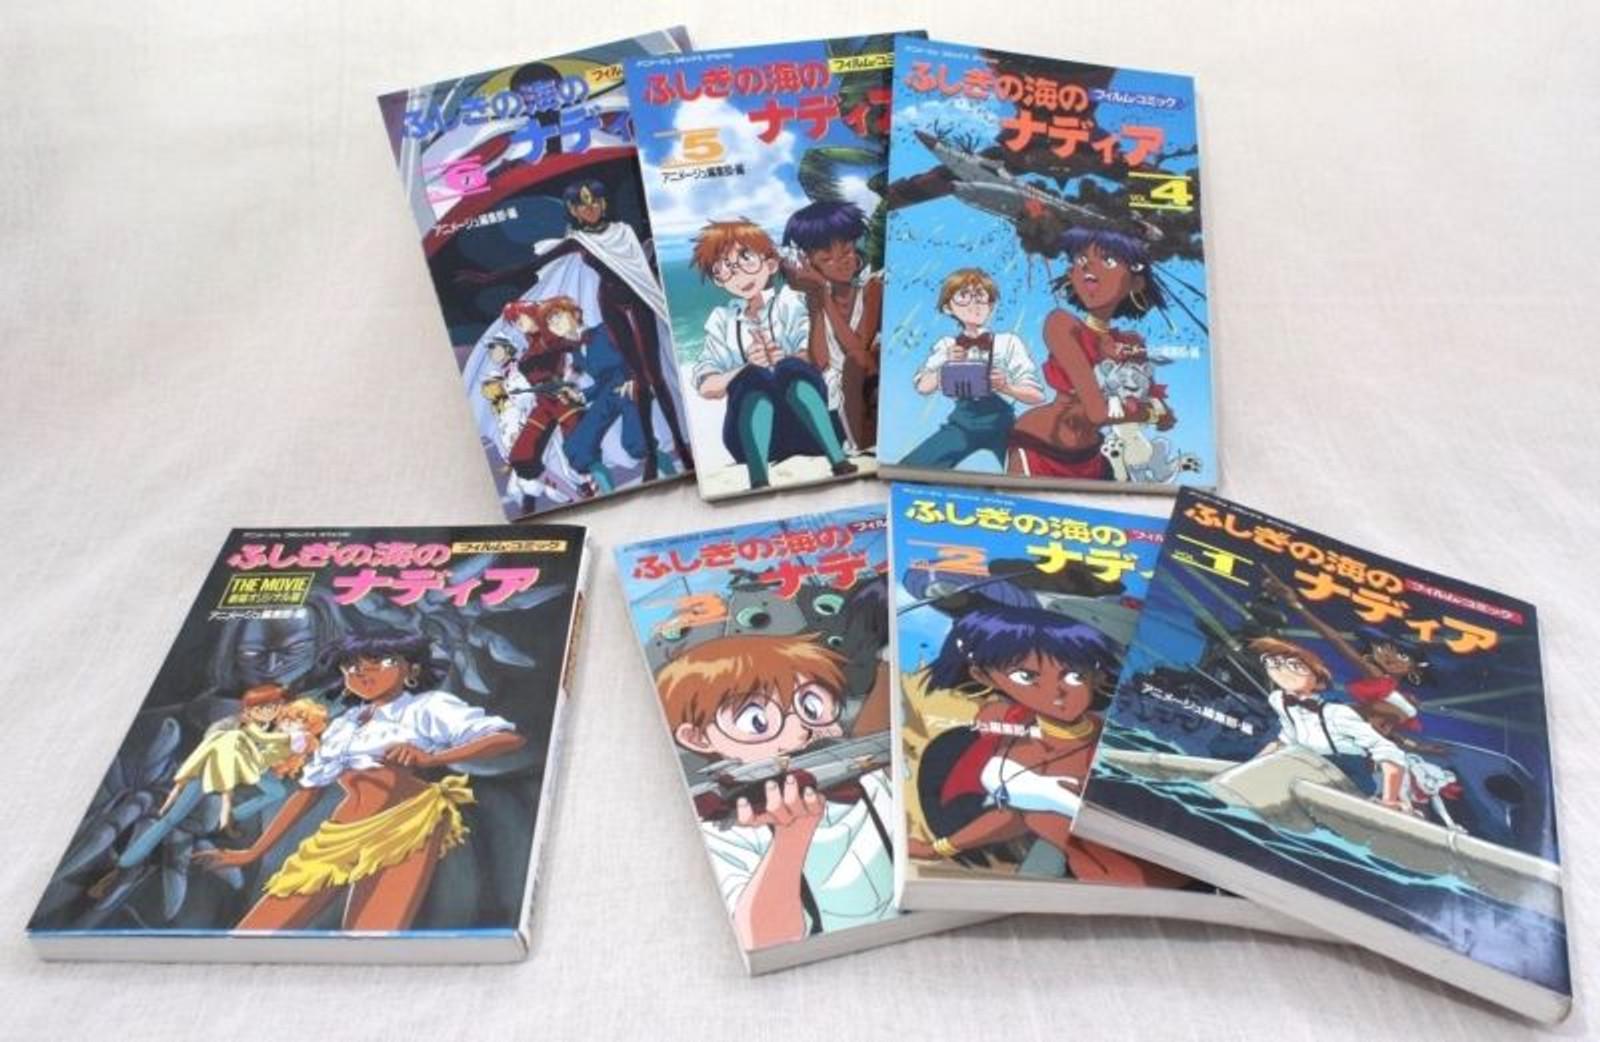 Set of 7 Nadia The Secret of Blue Water Film Books Vol.1-6+Movie JAPAN ANIME COMICS